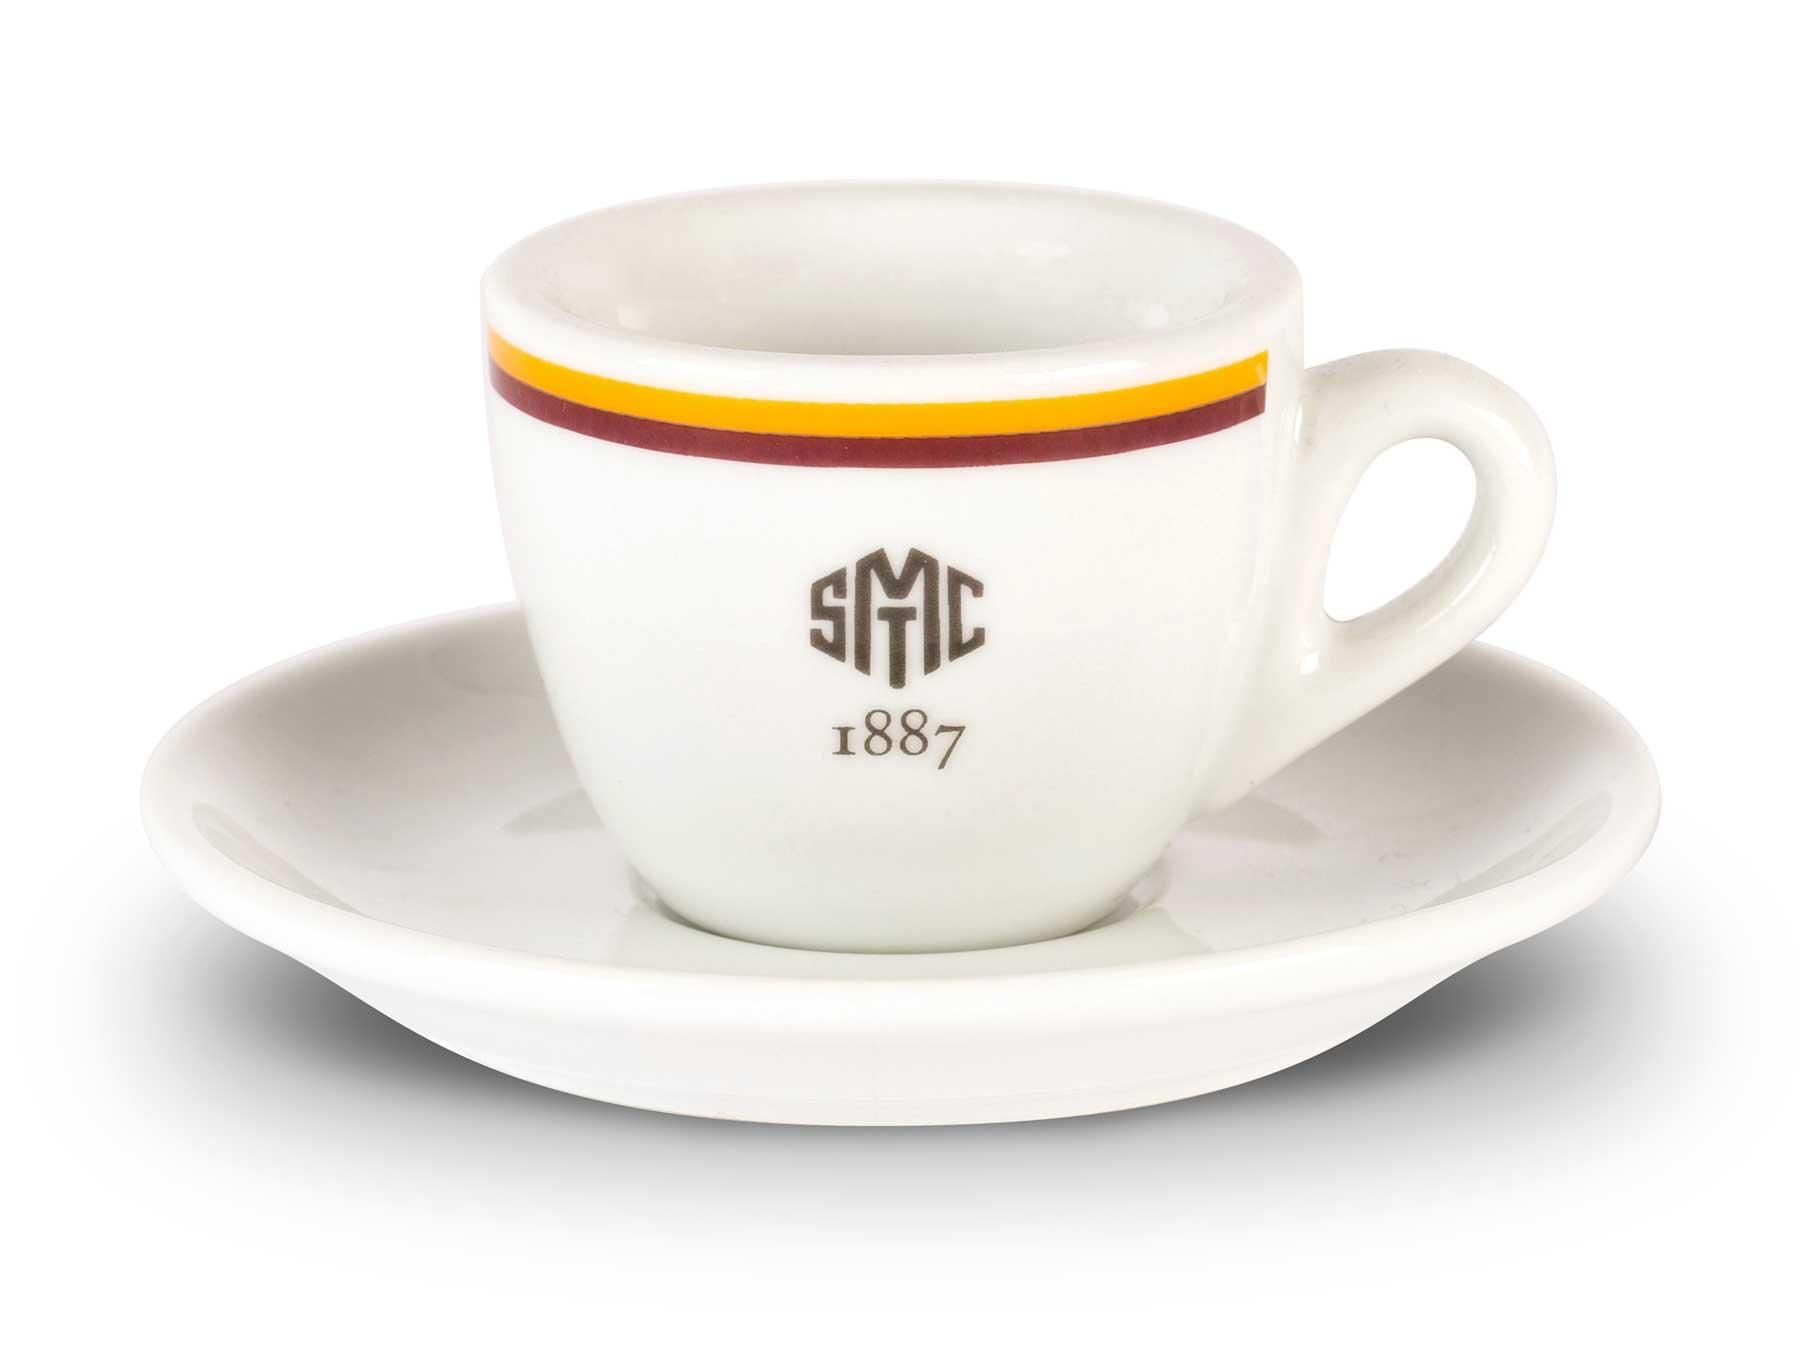 St Moritz Tobogganing Club Espresso Cup